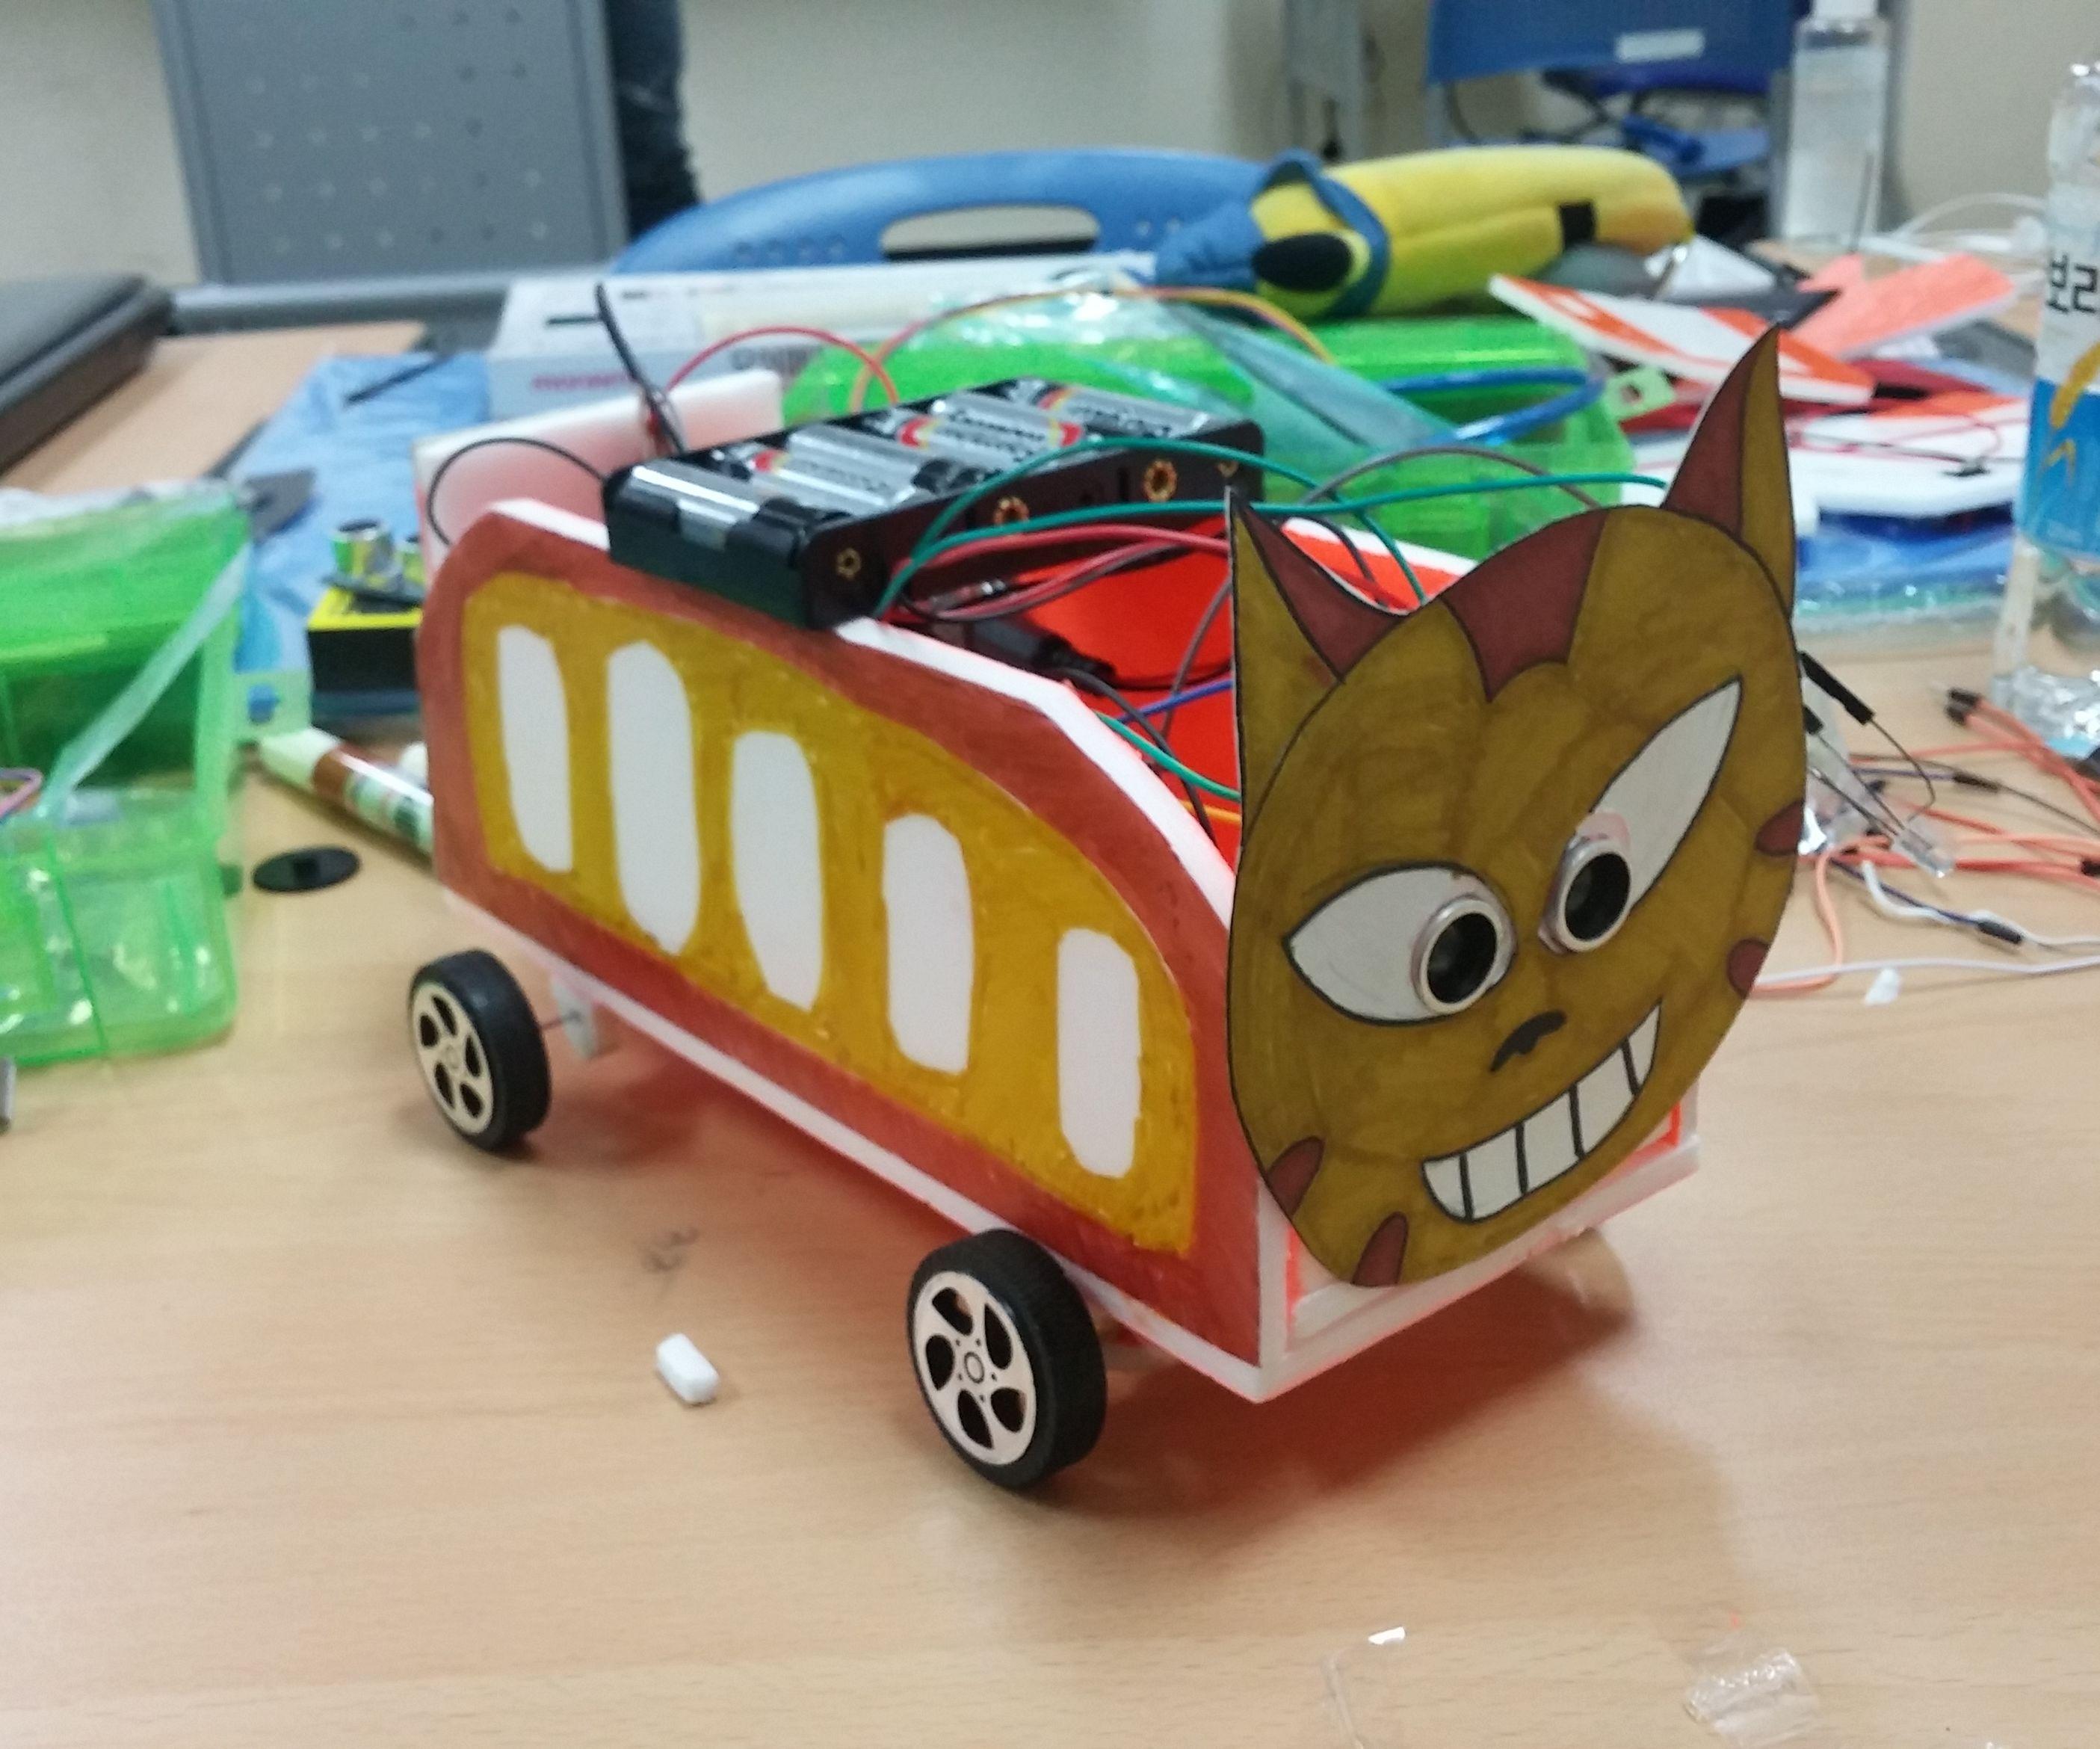 Aduino UNO를 이용한 도망치는 자동차 장난감 만들기